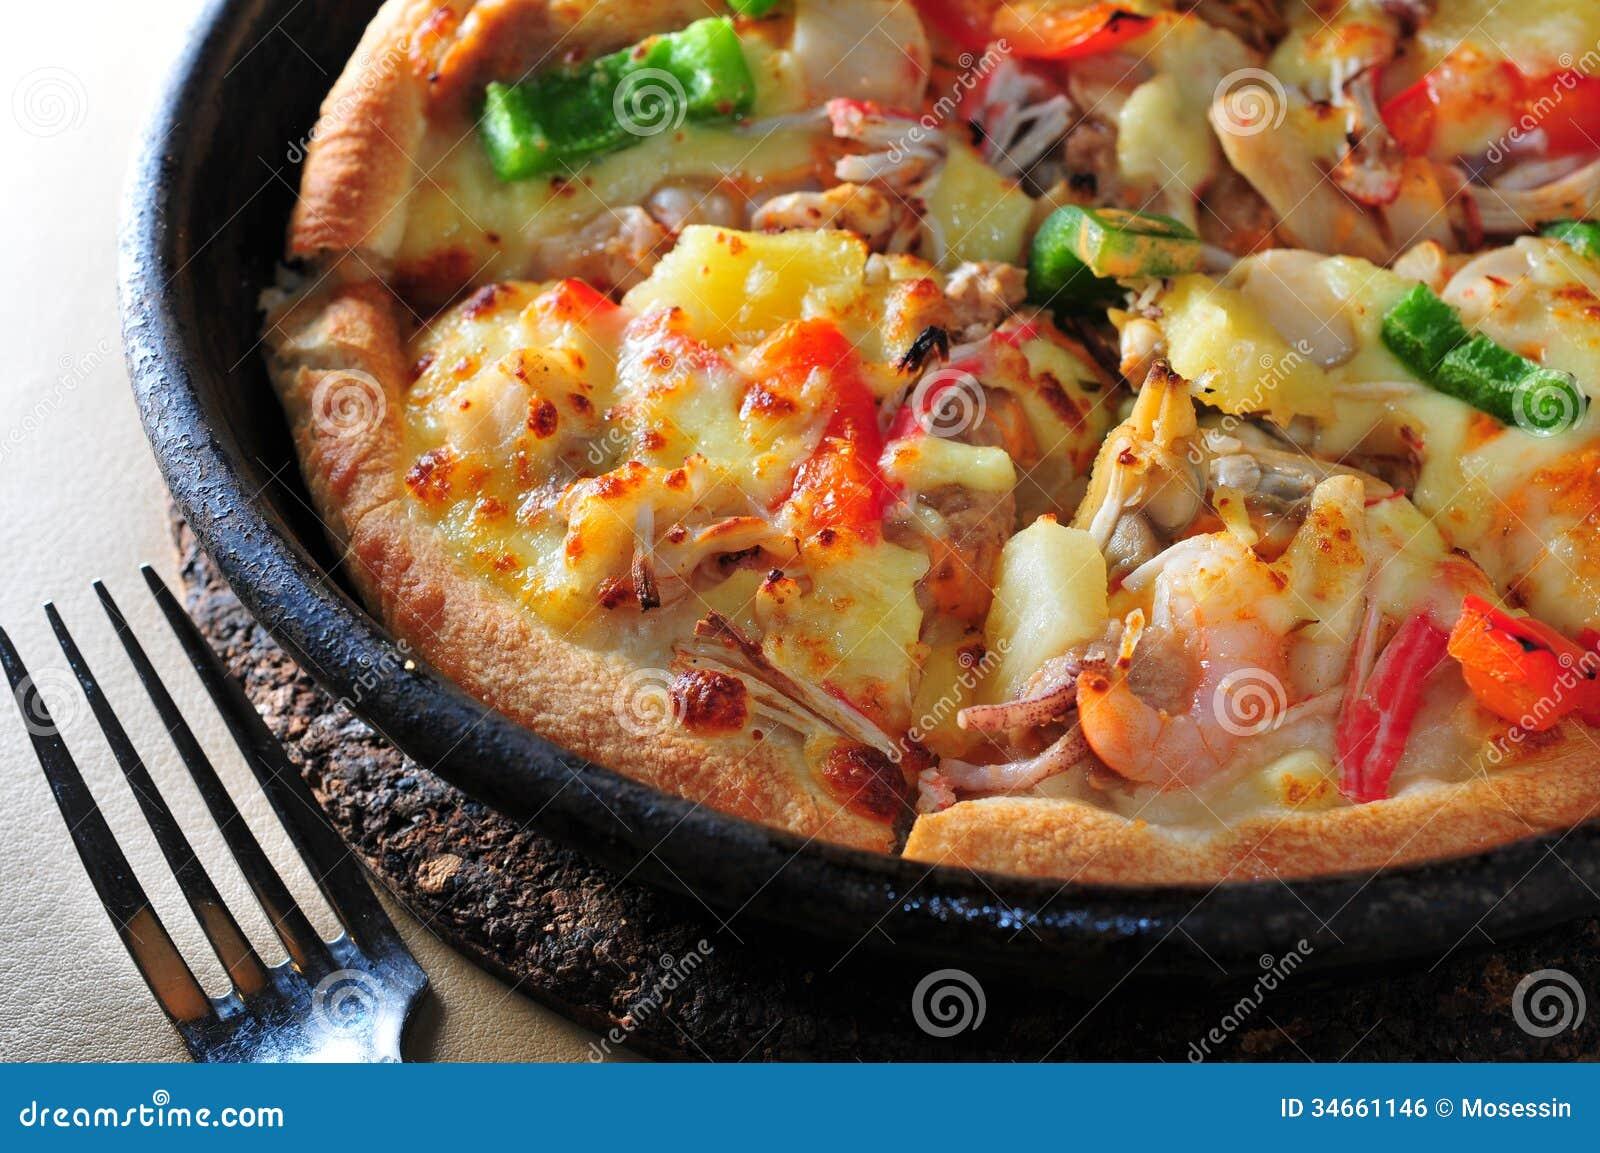 tarte de pizza de fruits de mer image libre de droits image 34661146. Black Bedroom Furniture Sets. Home Design Ideas